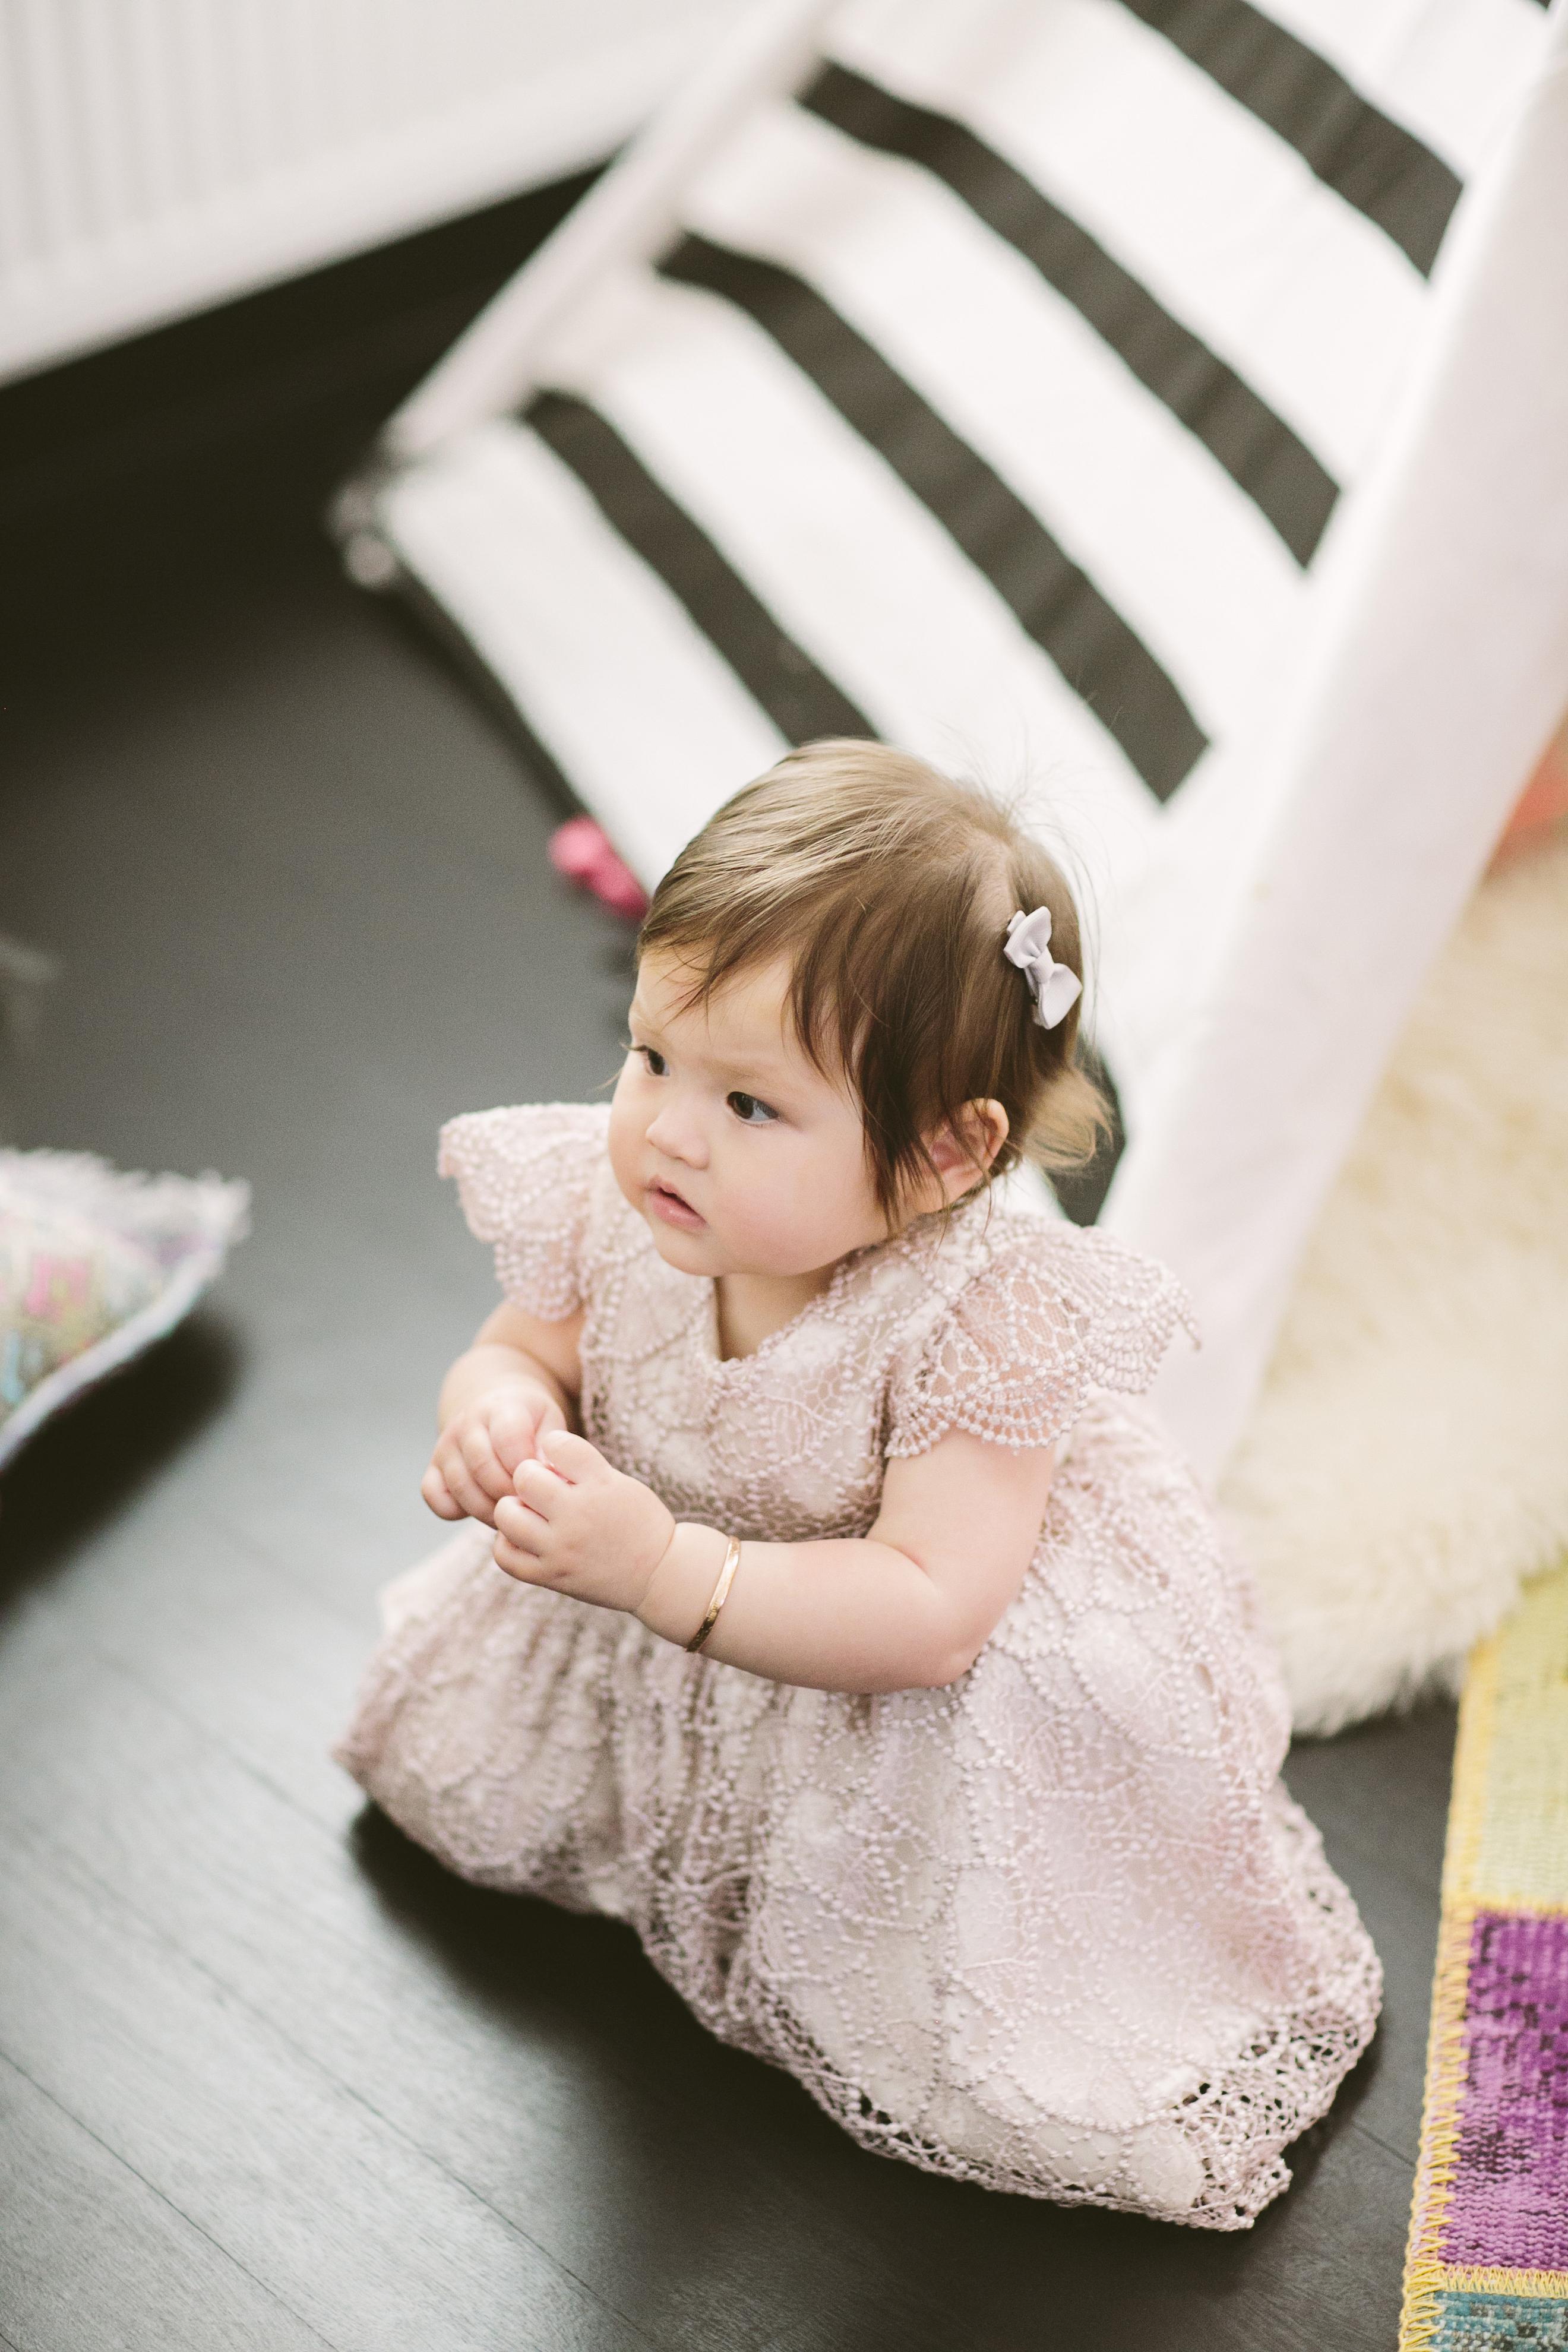 sarah jane young, sheissarahjane, kids designer fashion, baby fashion, fashion designer, australian fashion designer, monica morog, monica morog coutoure, mummy blogger, miagraceturnsone